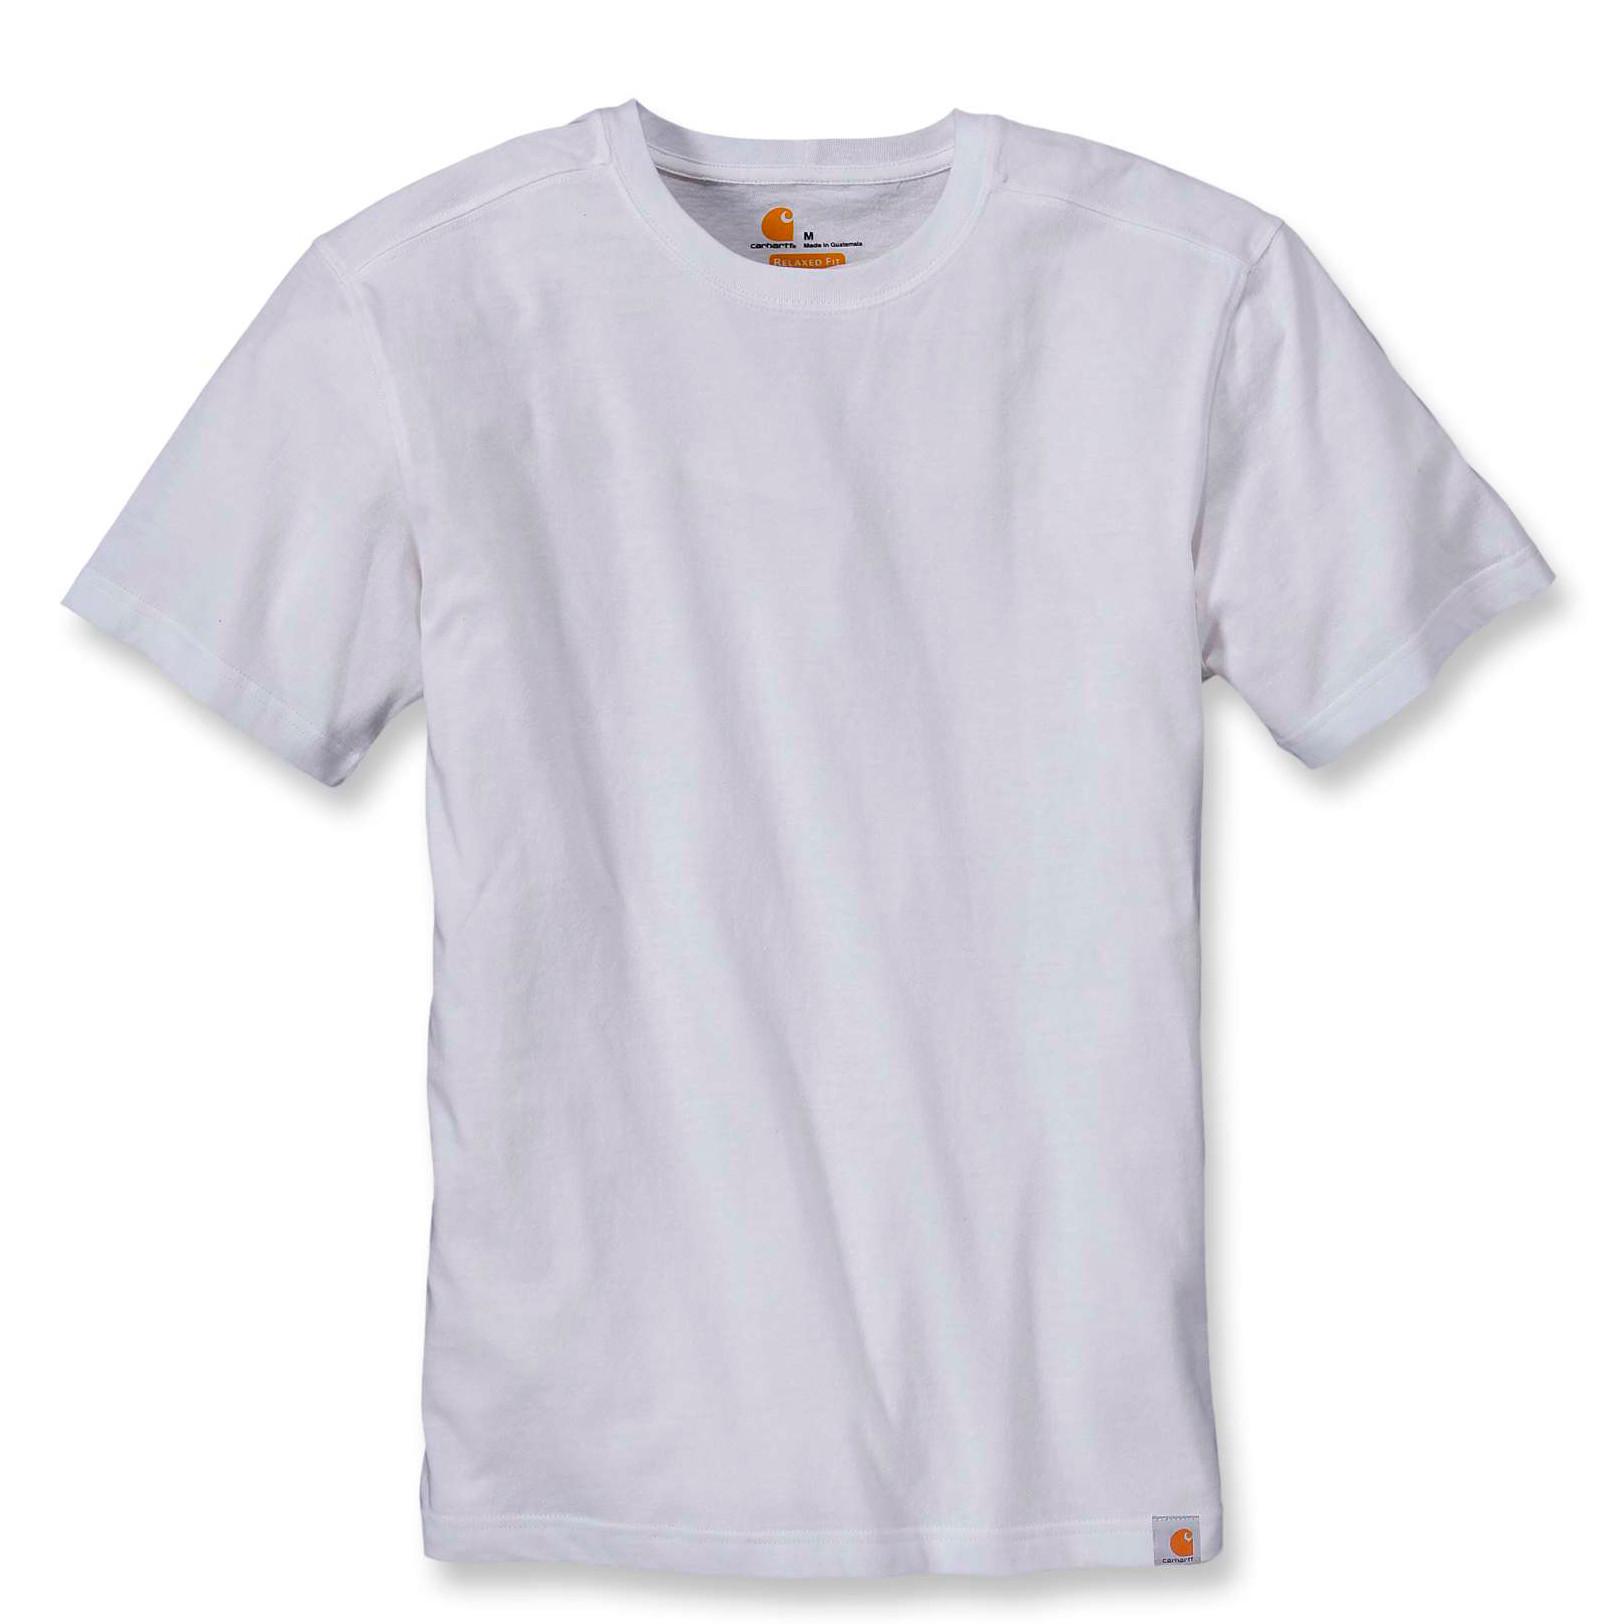 Футболка Carhartt Maddock T-Shirt S/S - 101124 (White, L)